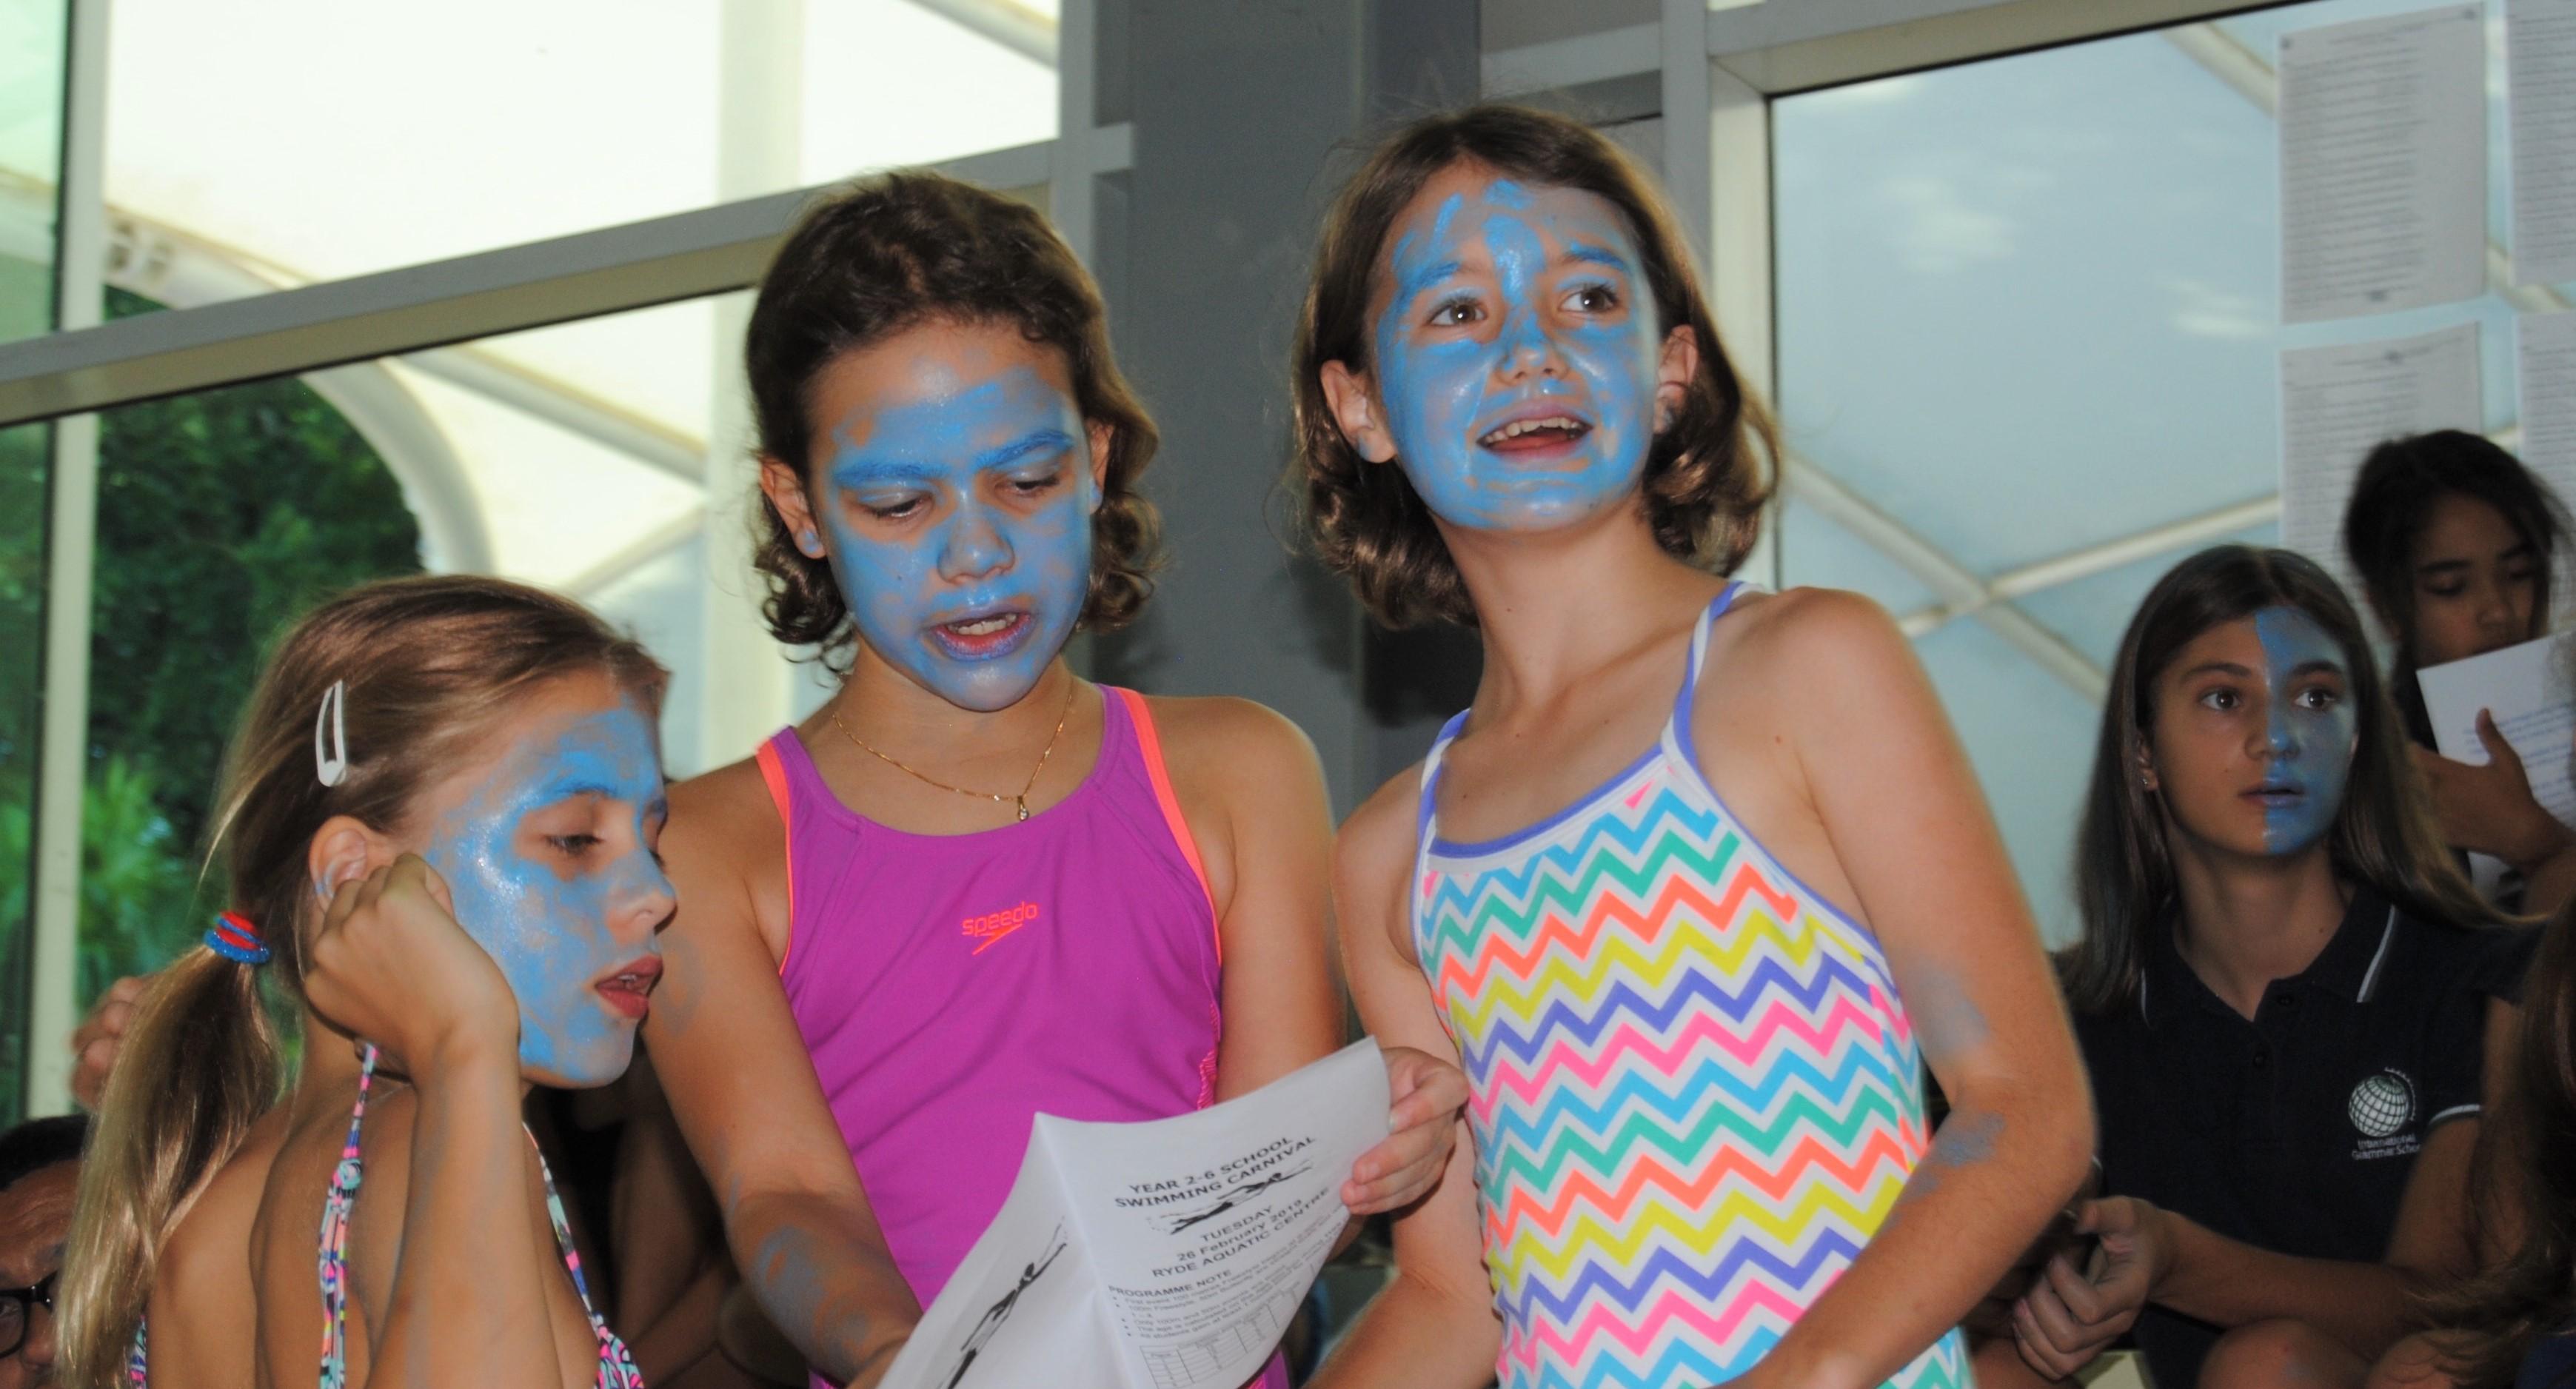 igs-primary-school-swimming-carnival-pool-race-cheering